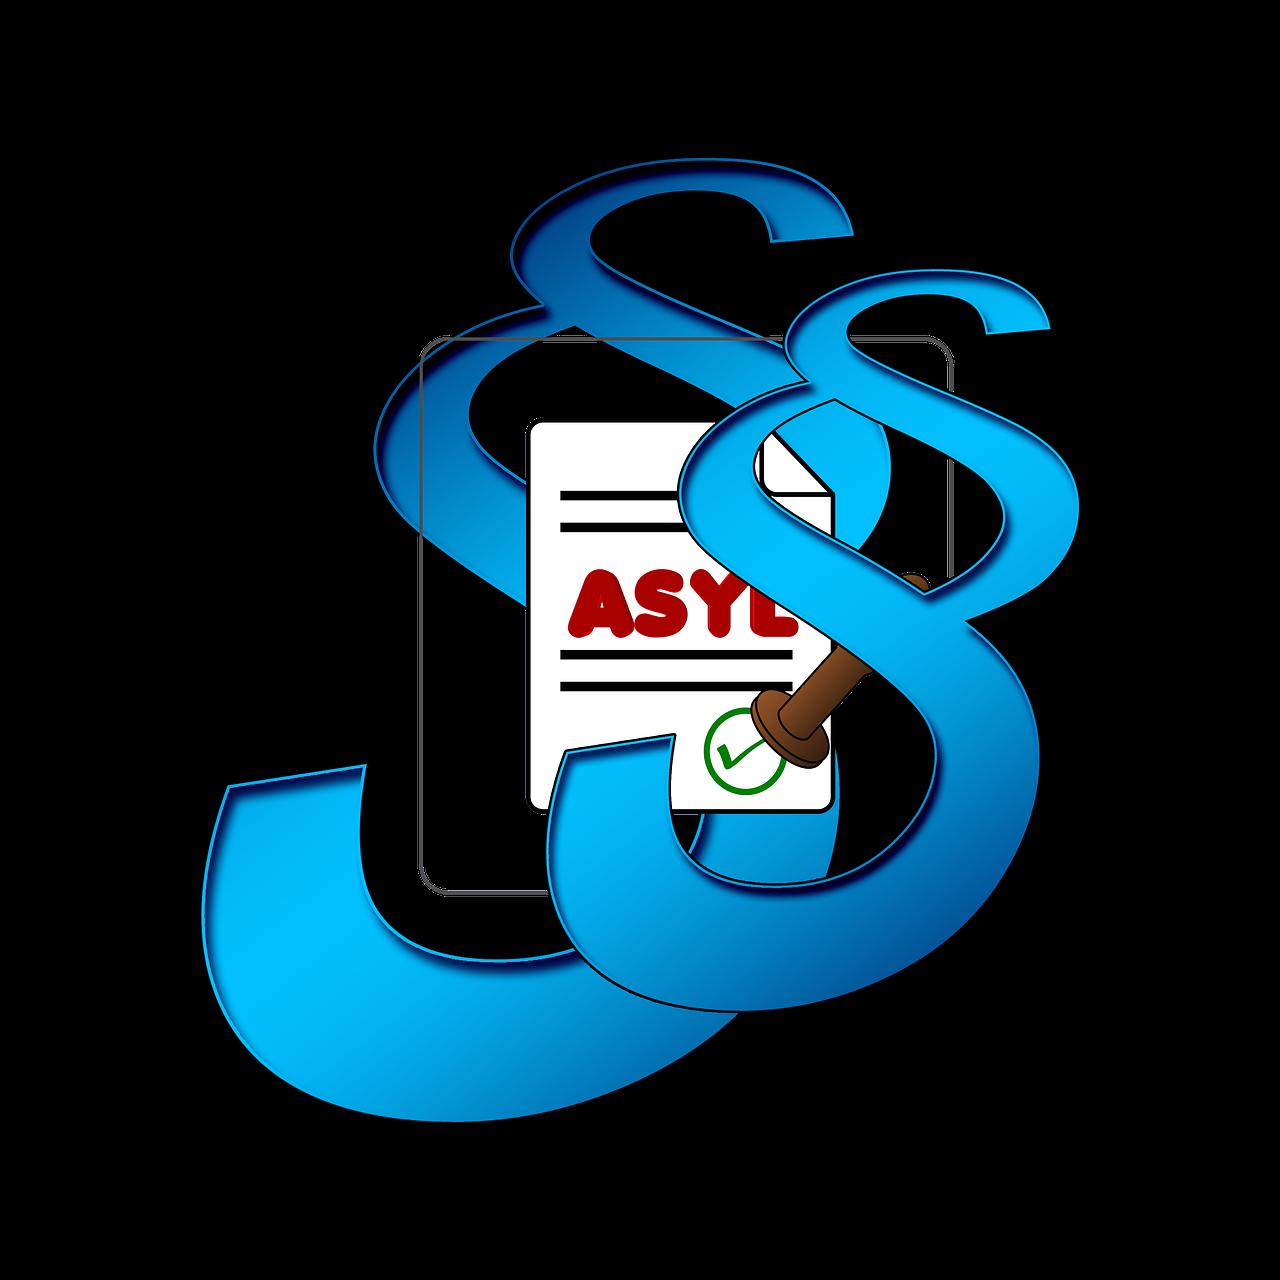 Asyl 1519122777